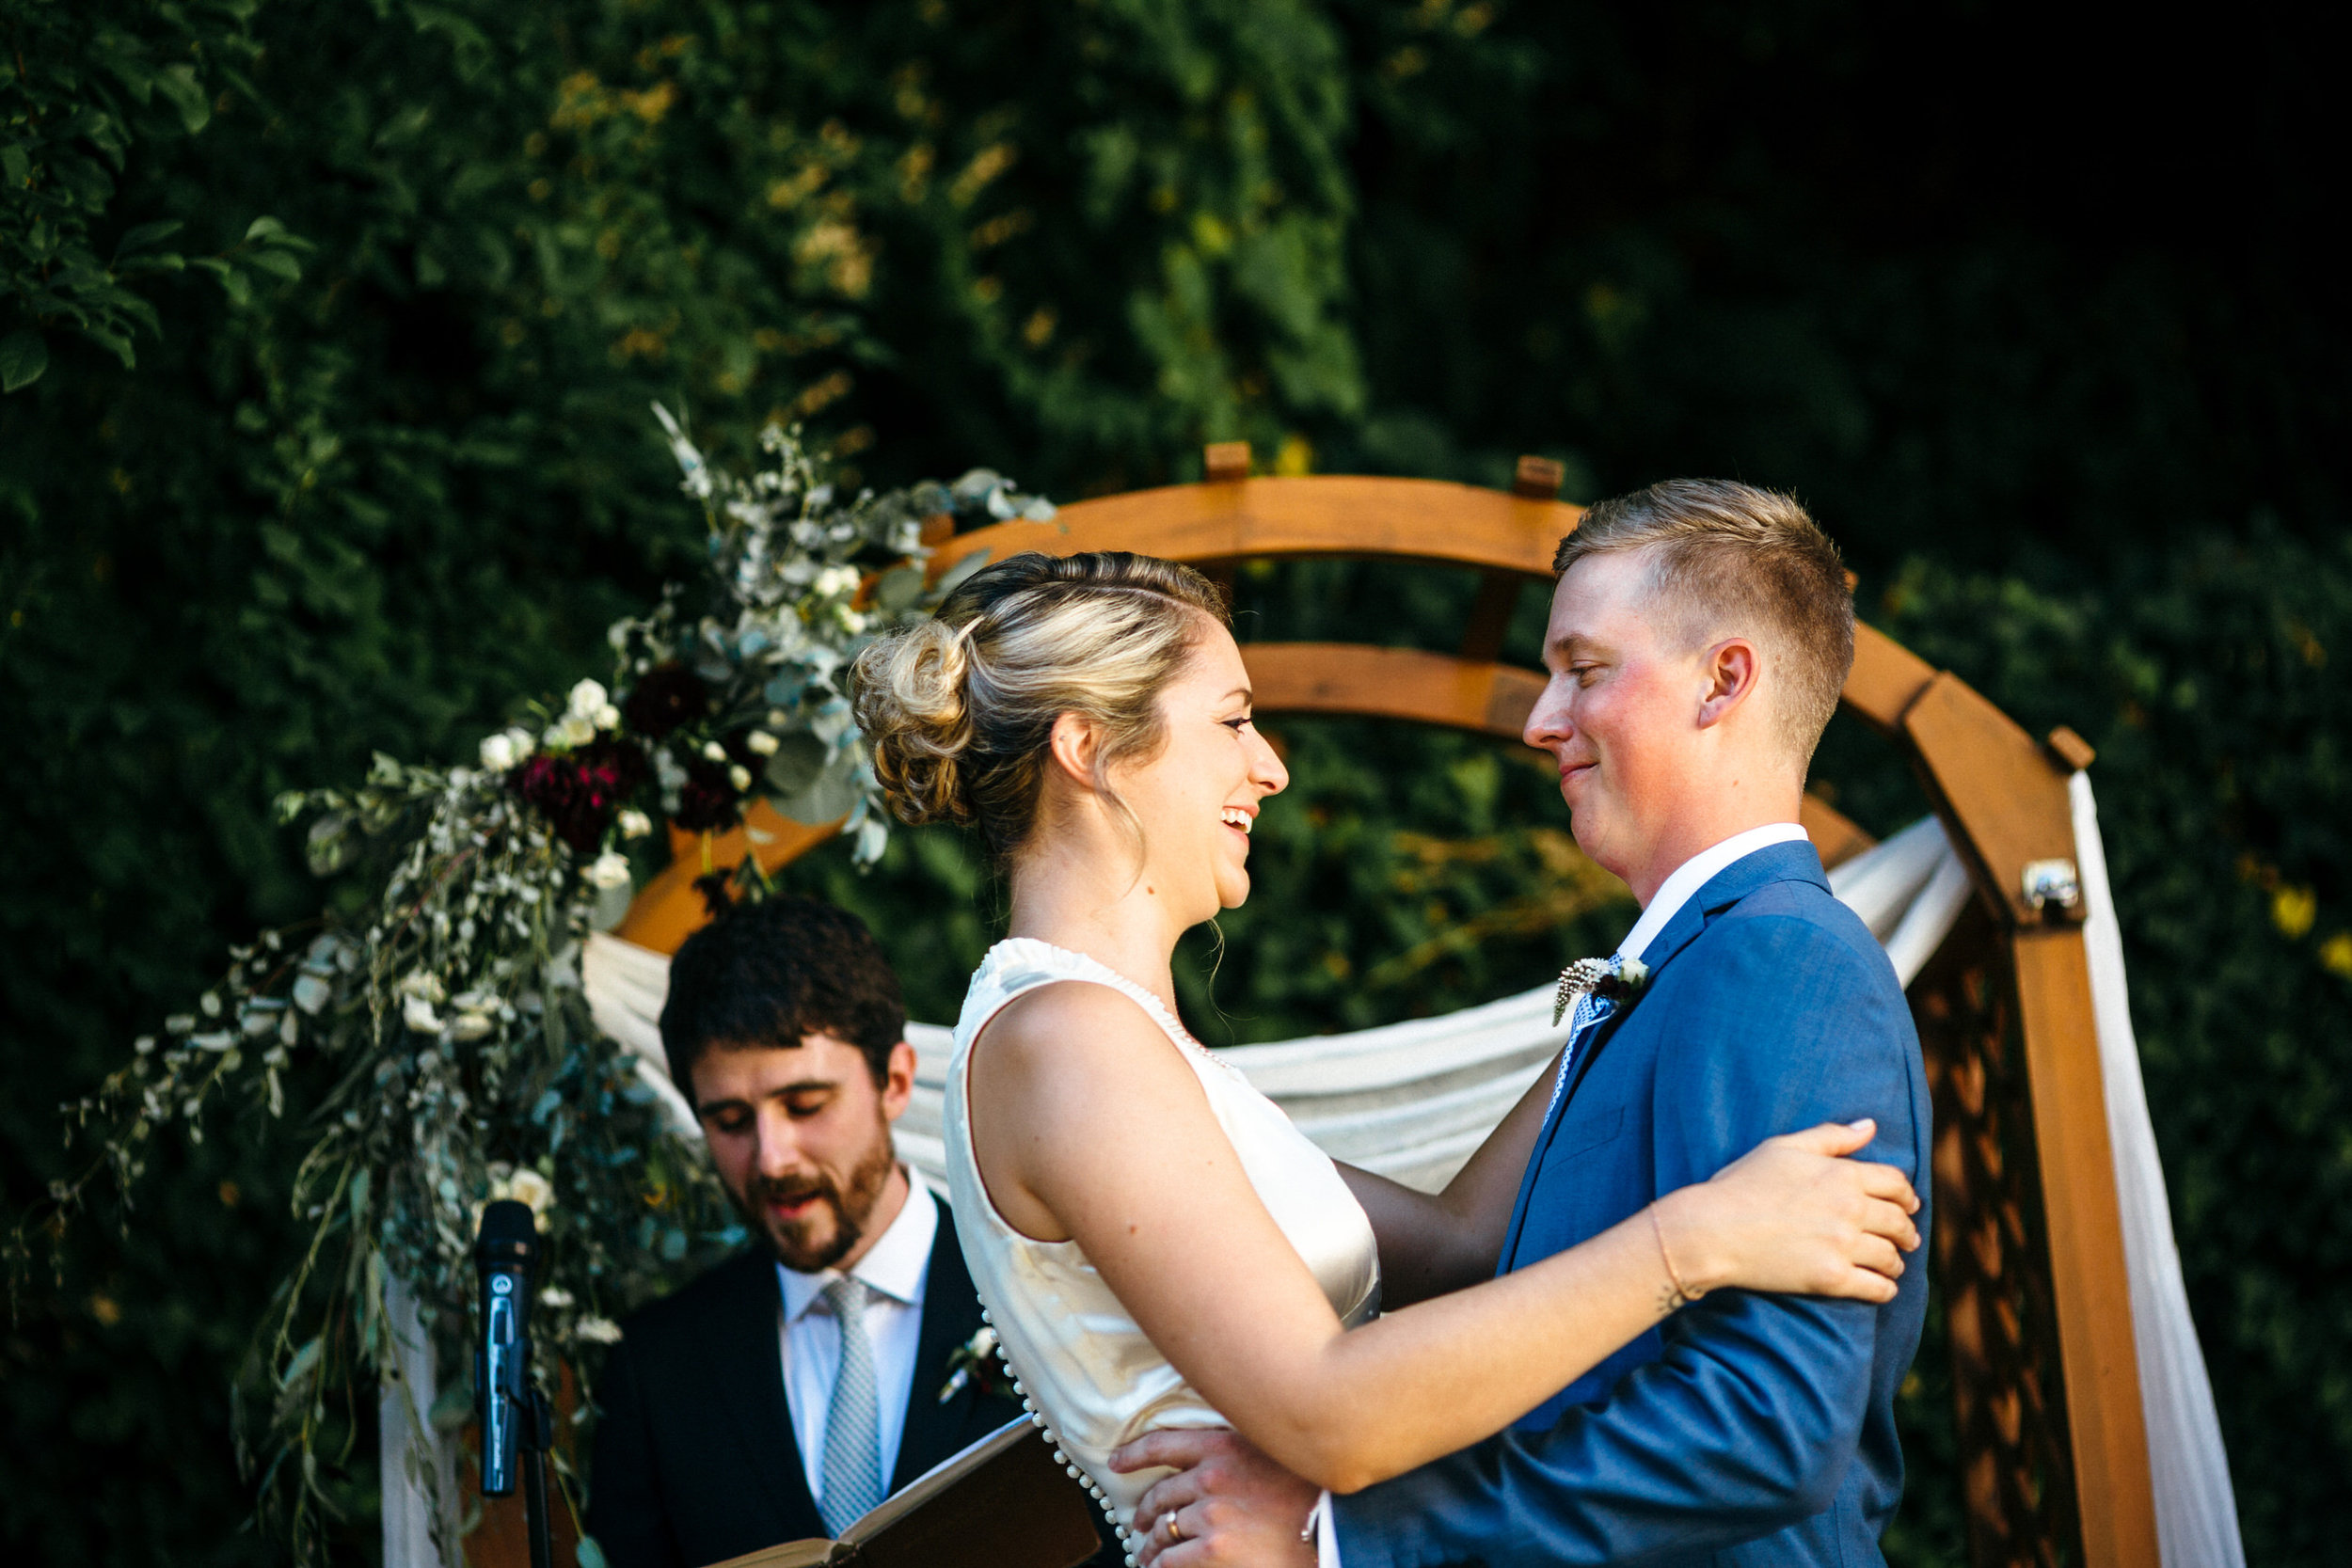 Laurelhurst Park club wedding photographer Portand pdx Oregon065.JPG